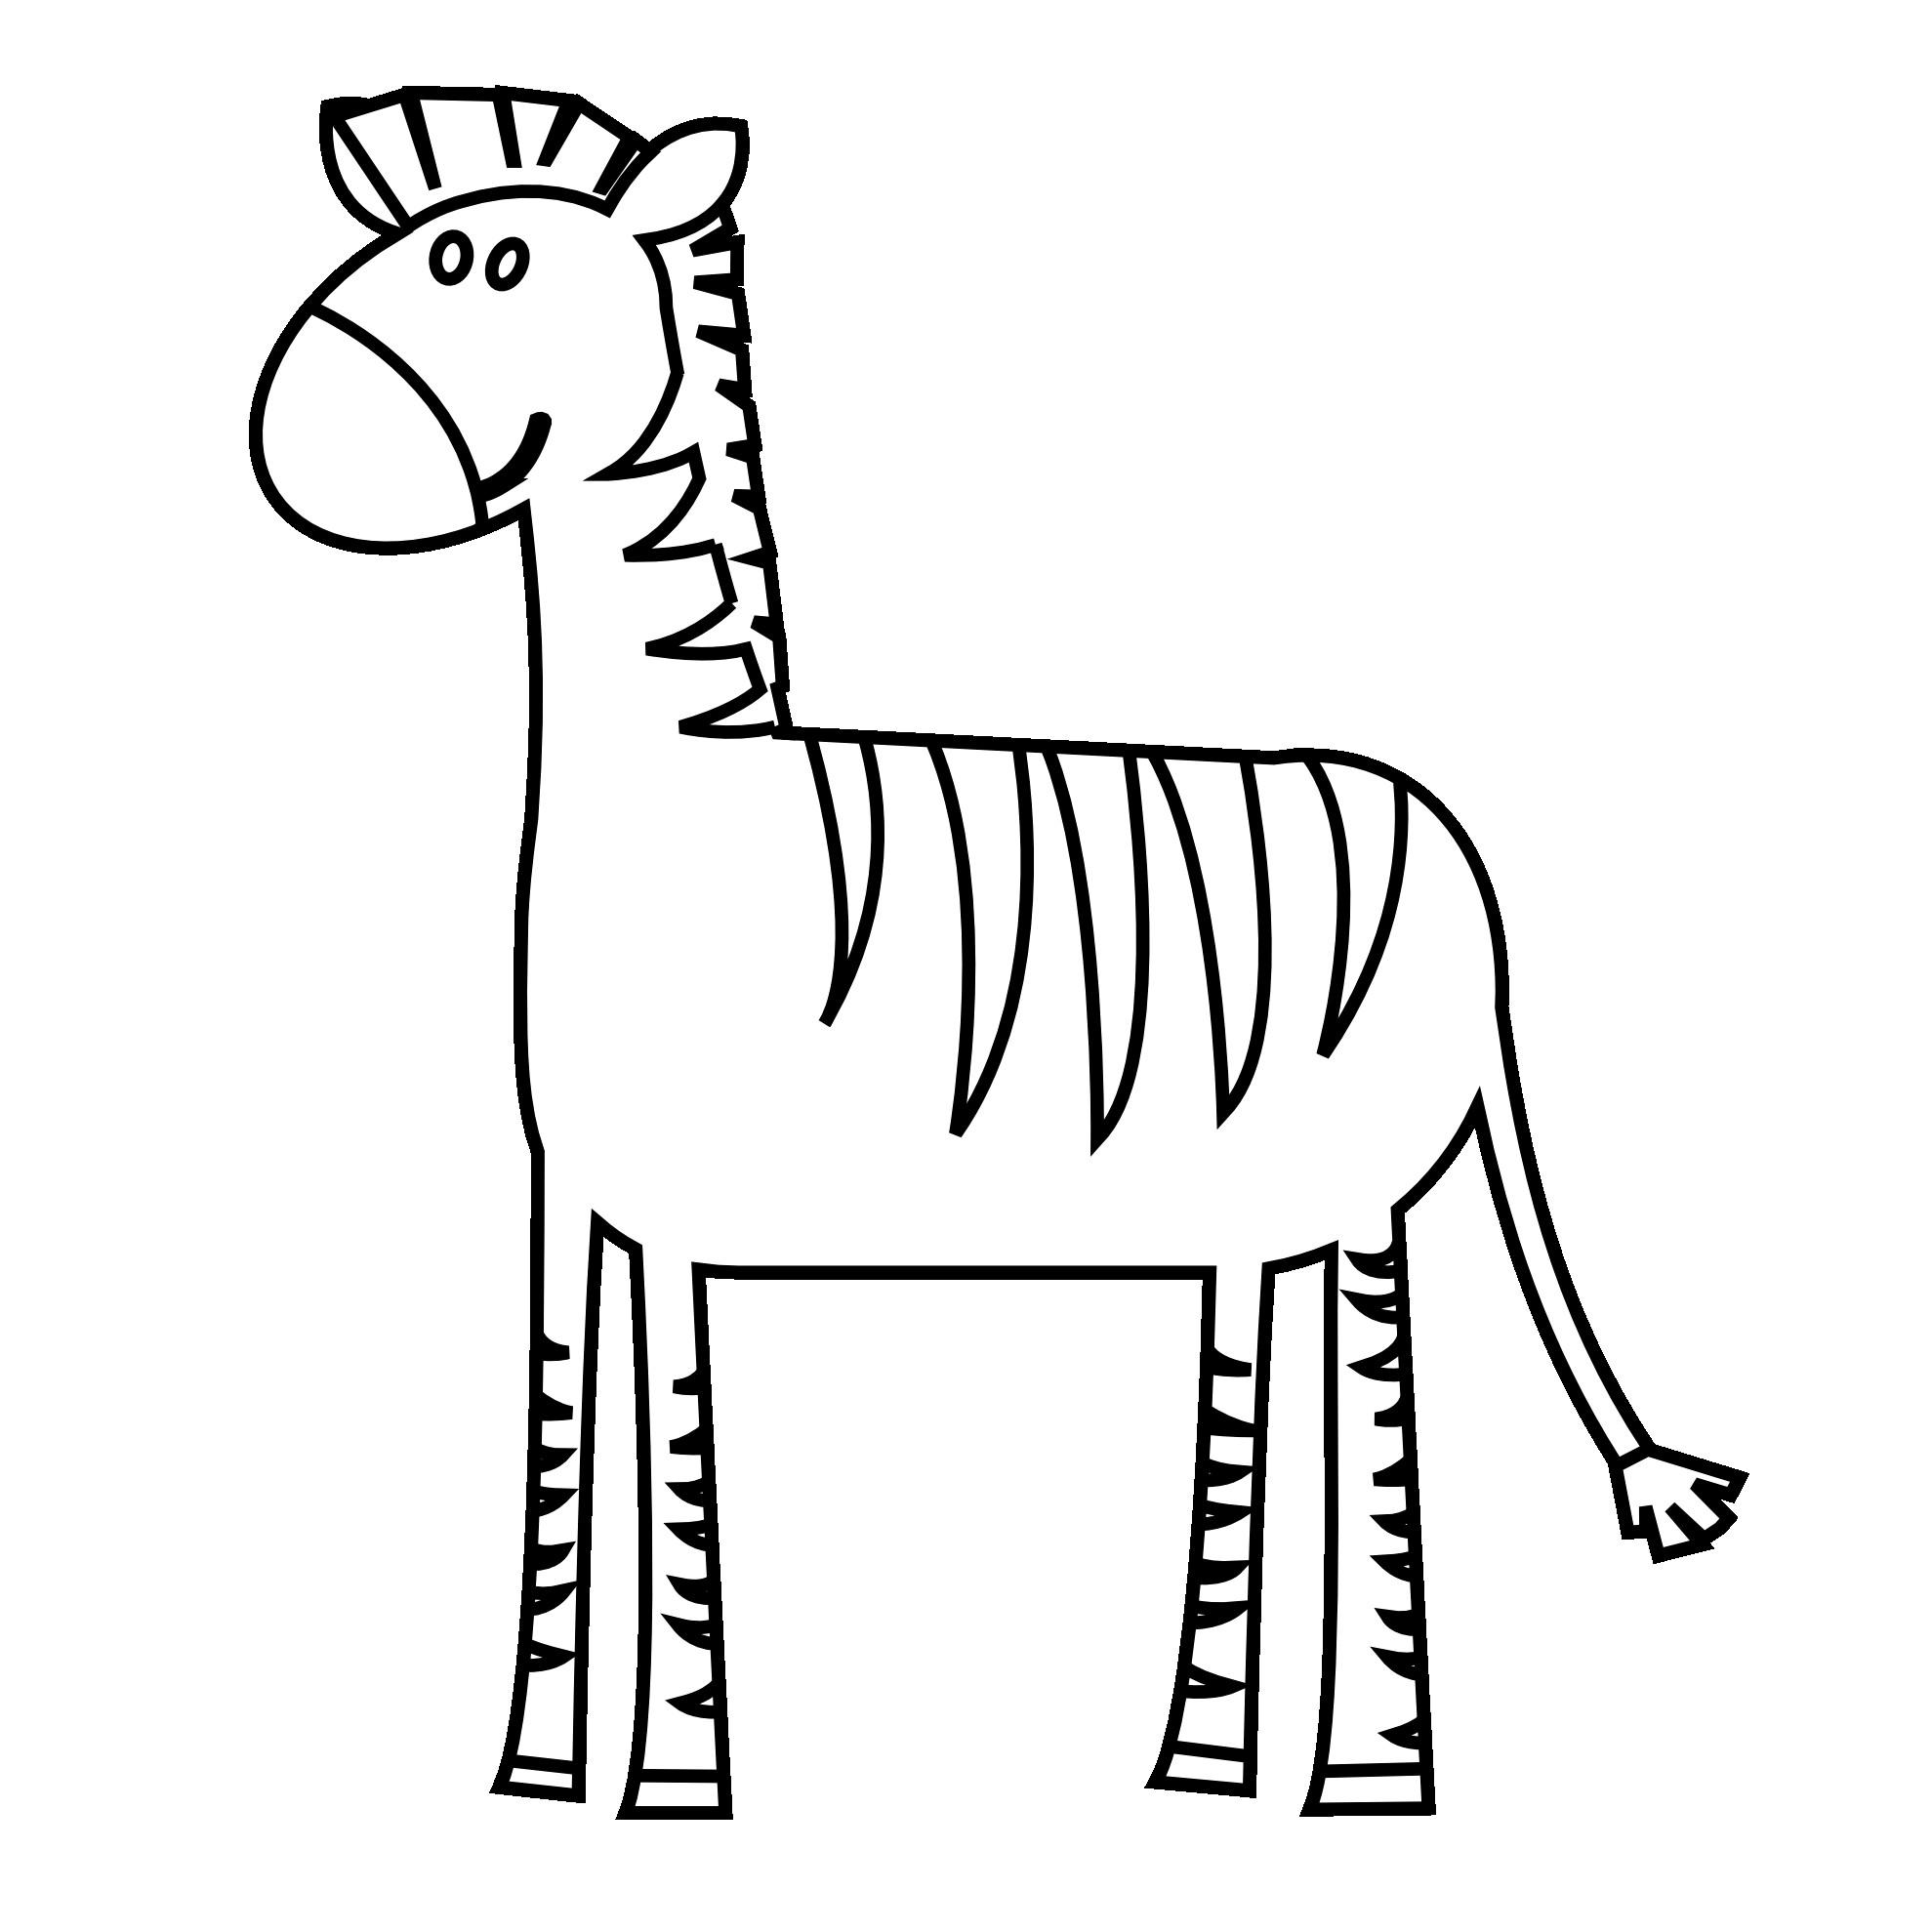 Zebra Drawing Easy.